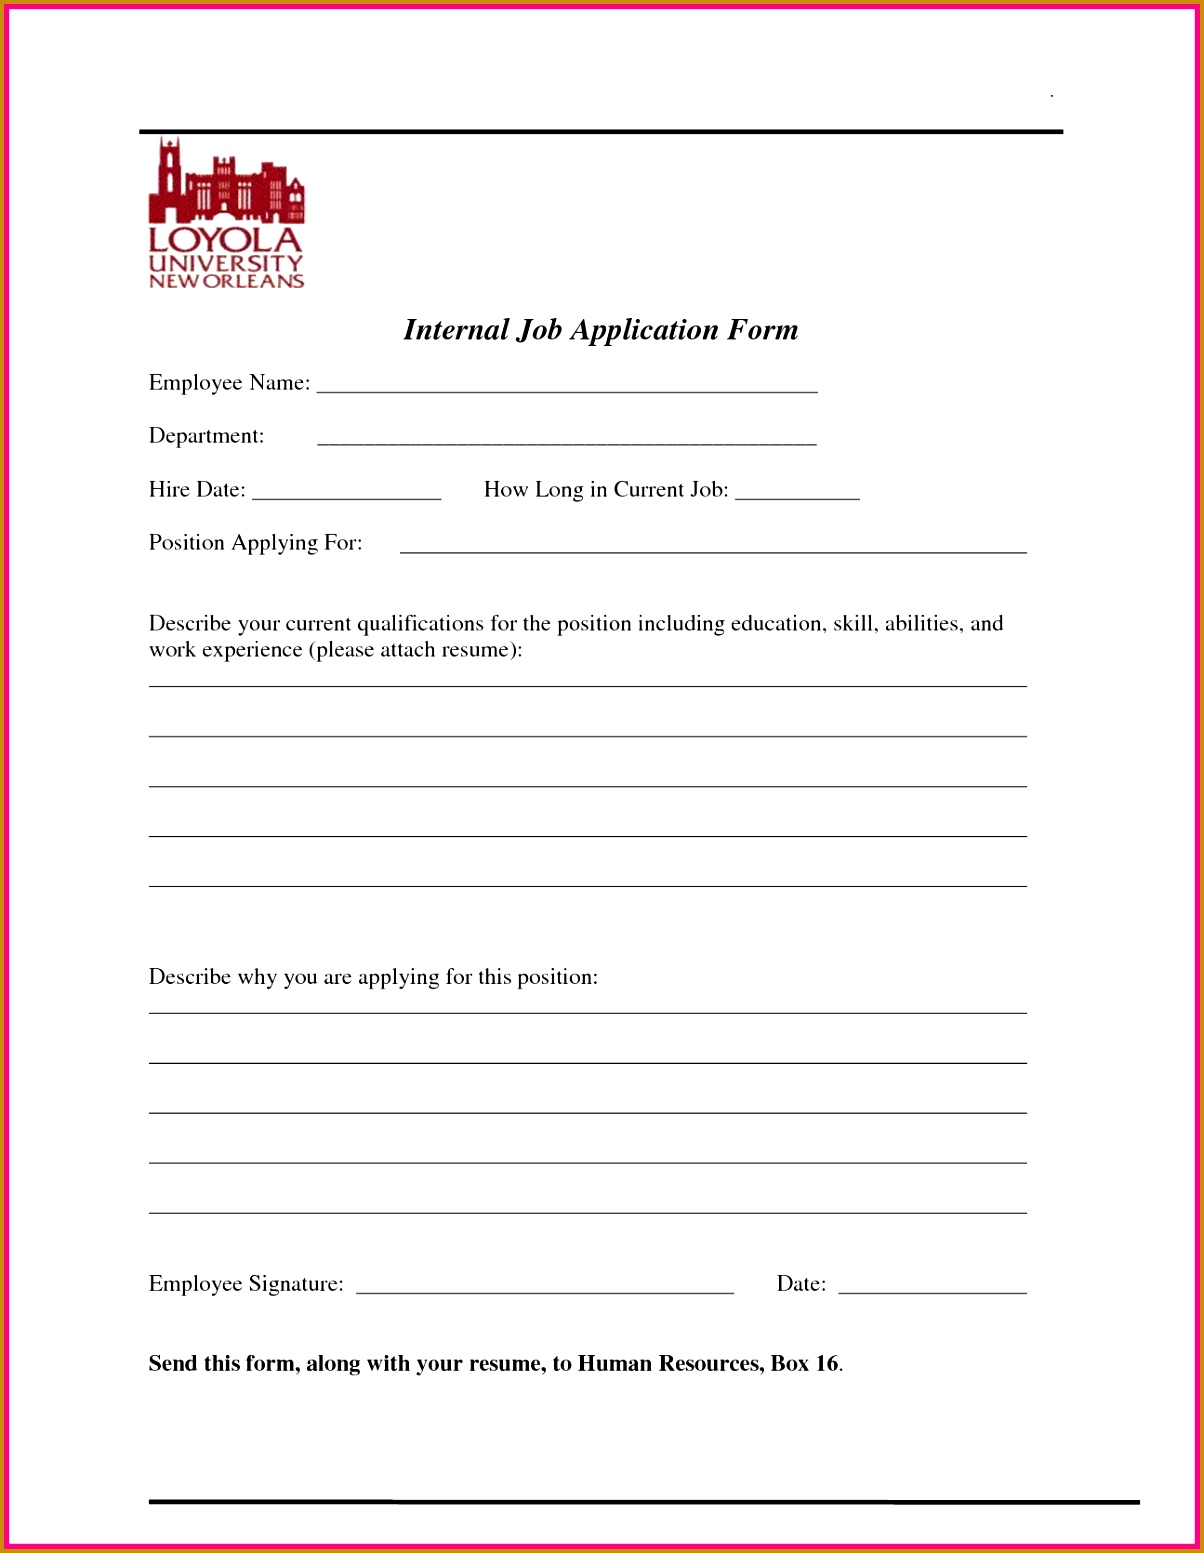 4 internal job application form template